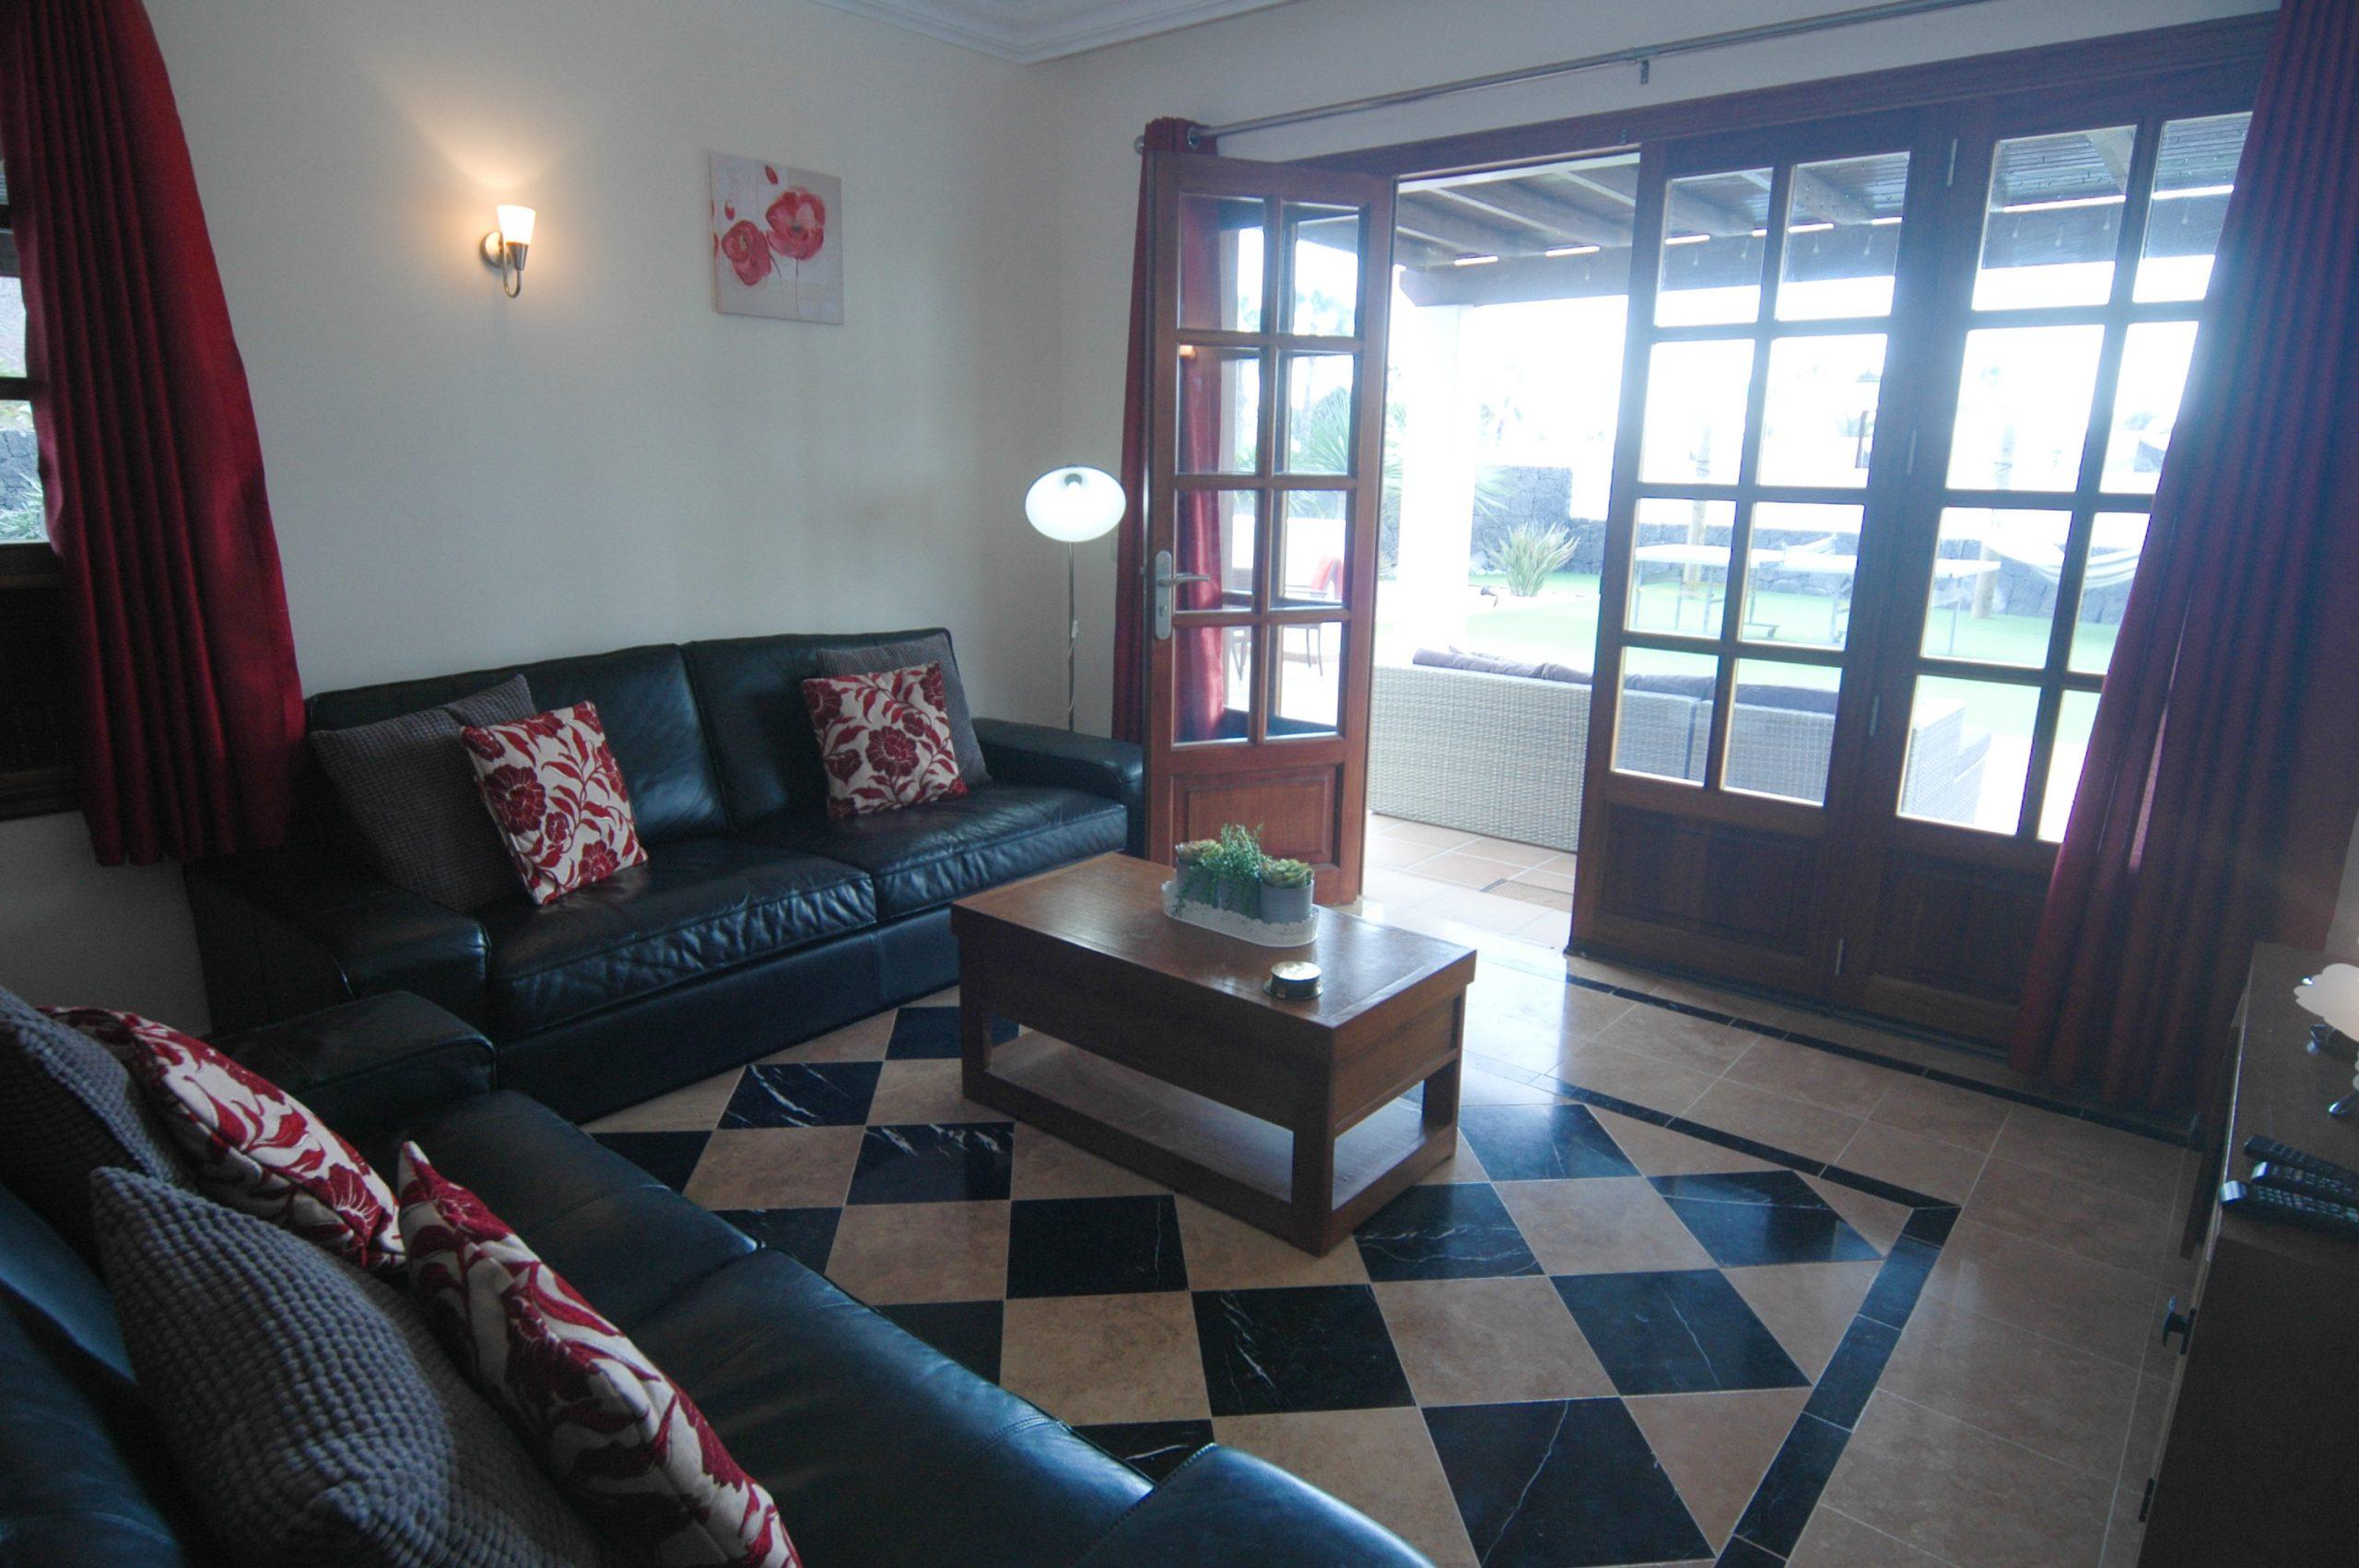 Villa_LVC338912 - Playa Blanca Villa lounge with IPTV, Xbox; DVD and wifi